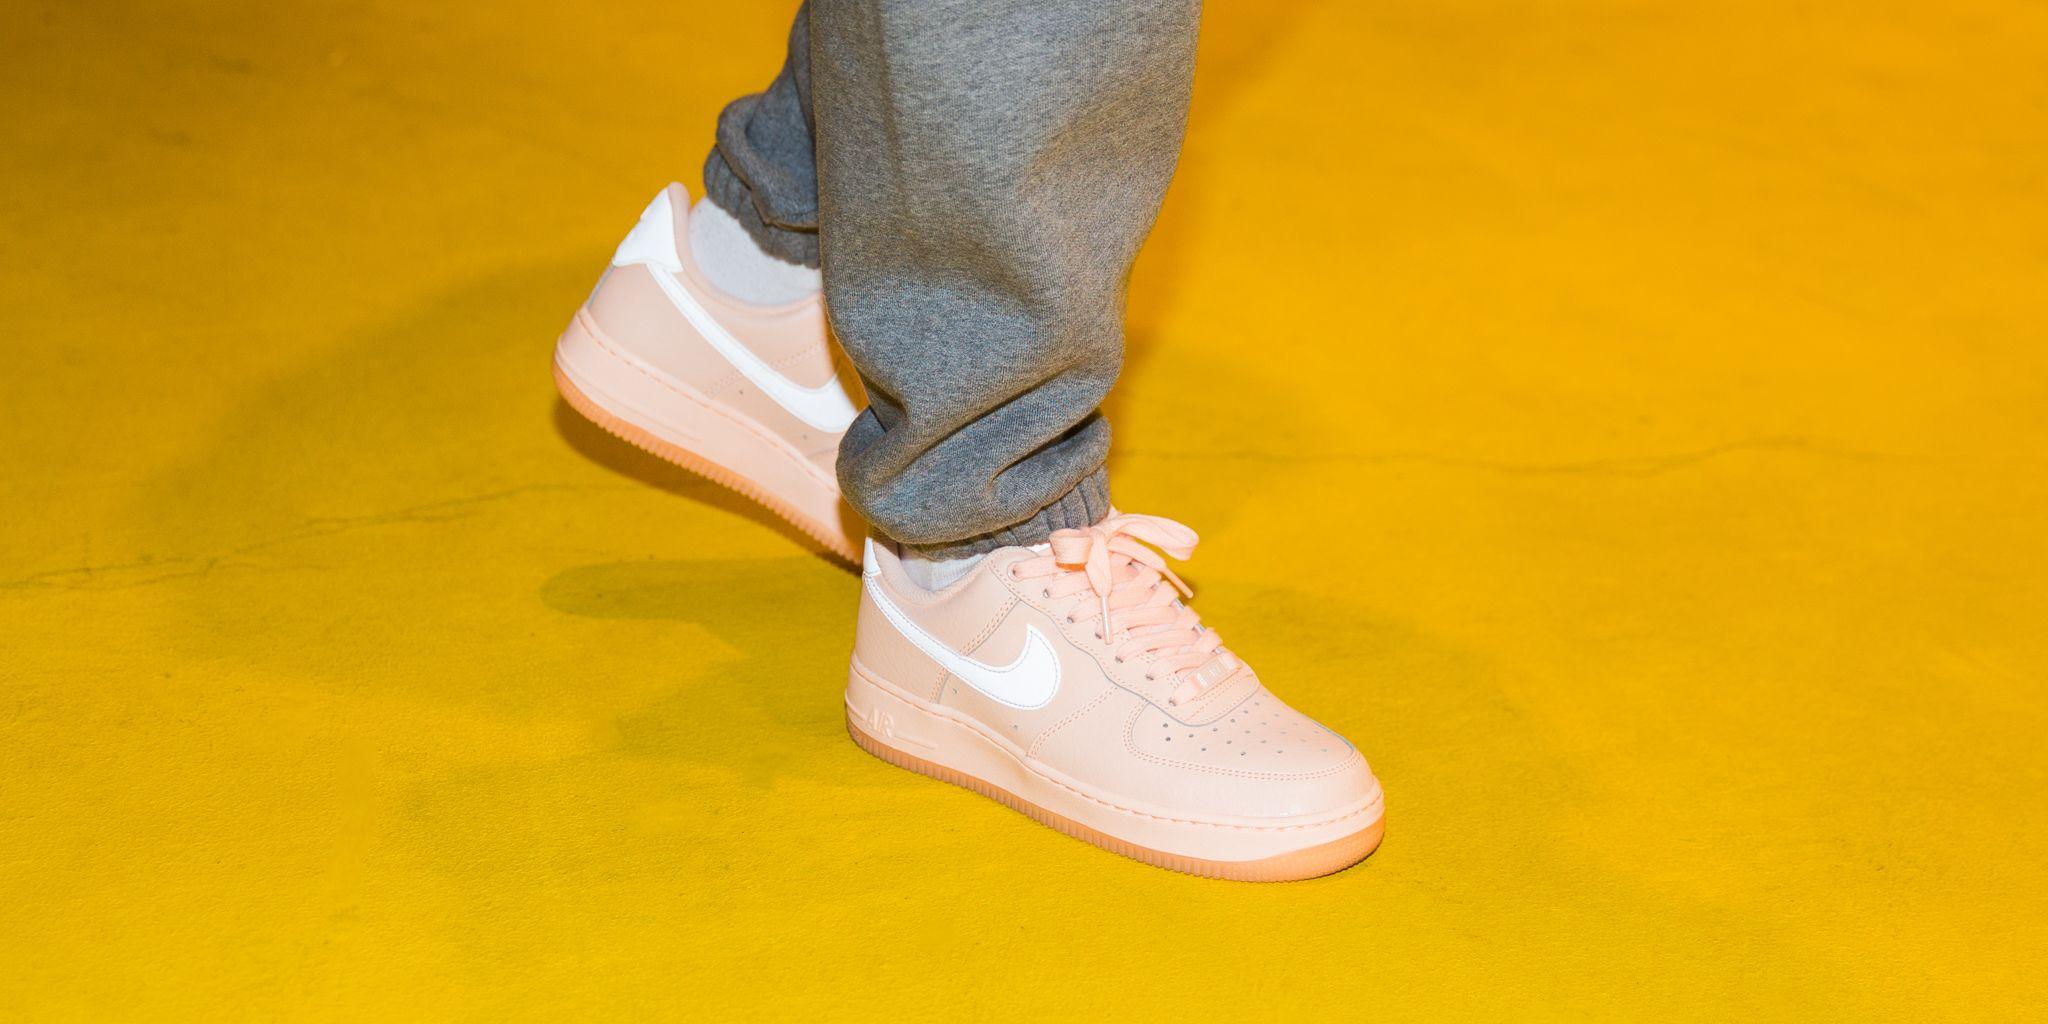 Nike Women's WMNS Air Force 1 07 ESS, Crimson TintCrimson